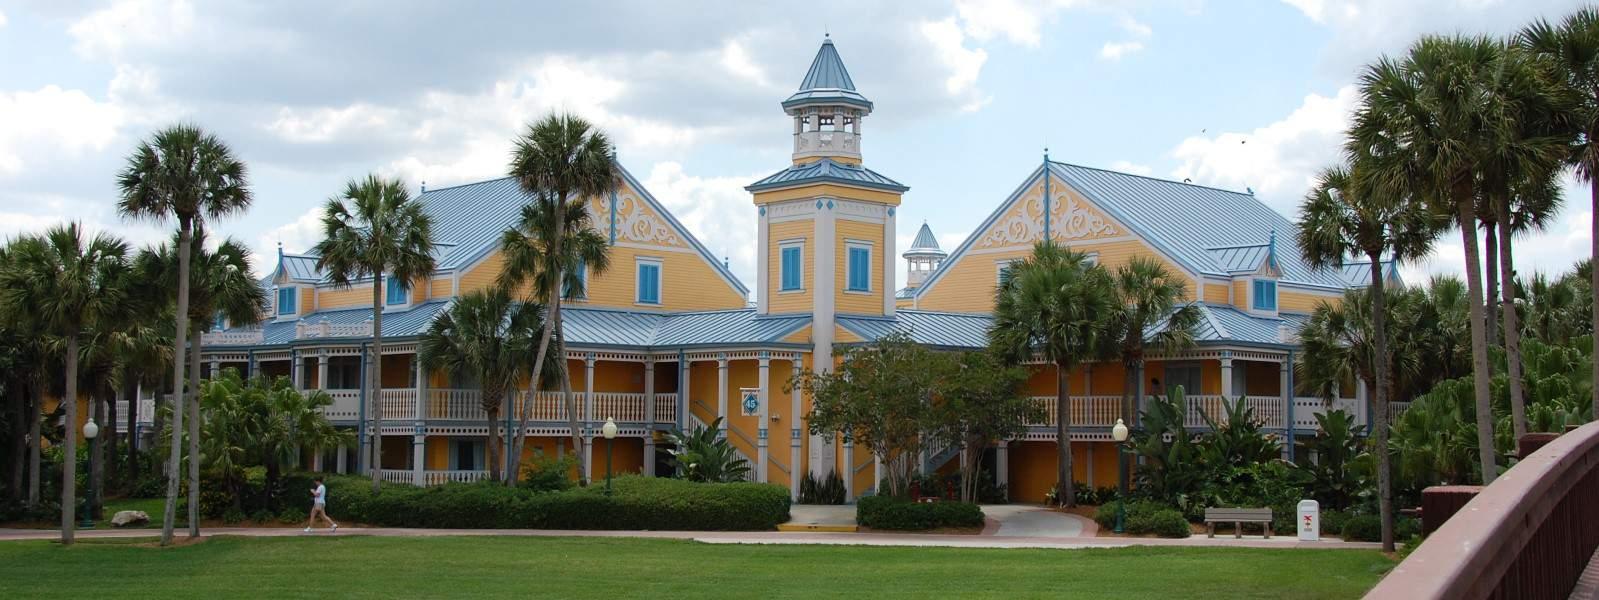 Disney's-Caribbean-Beach-Resort-Jamaica__compressed.jpg